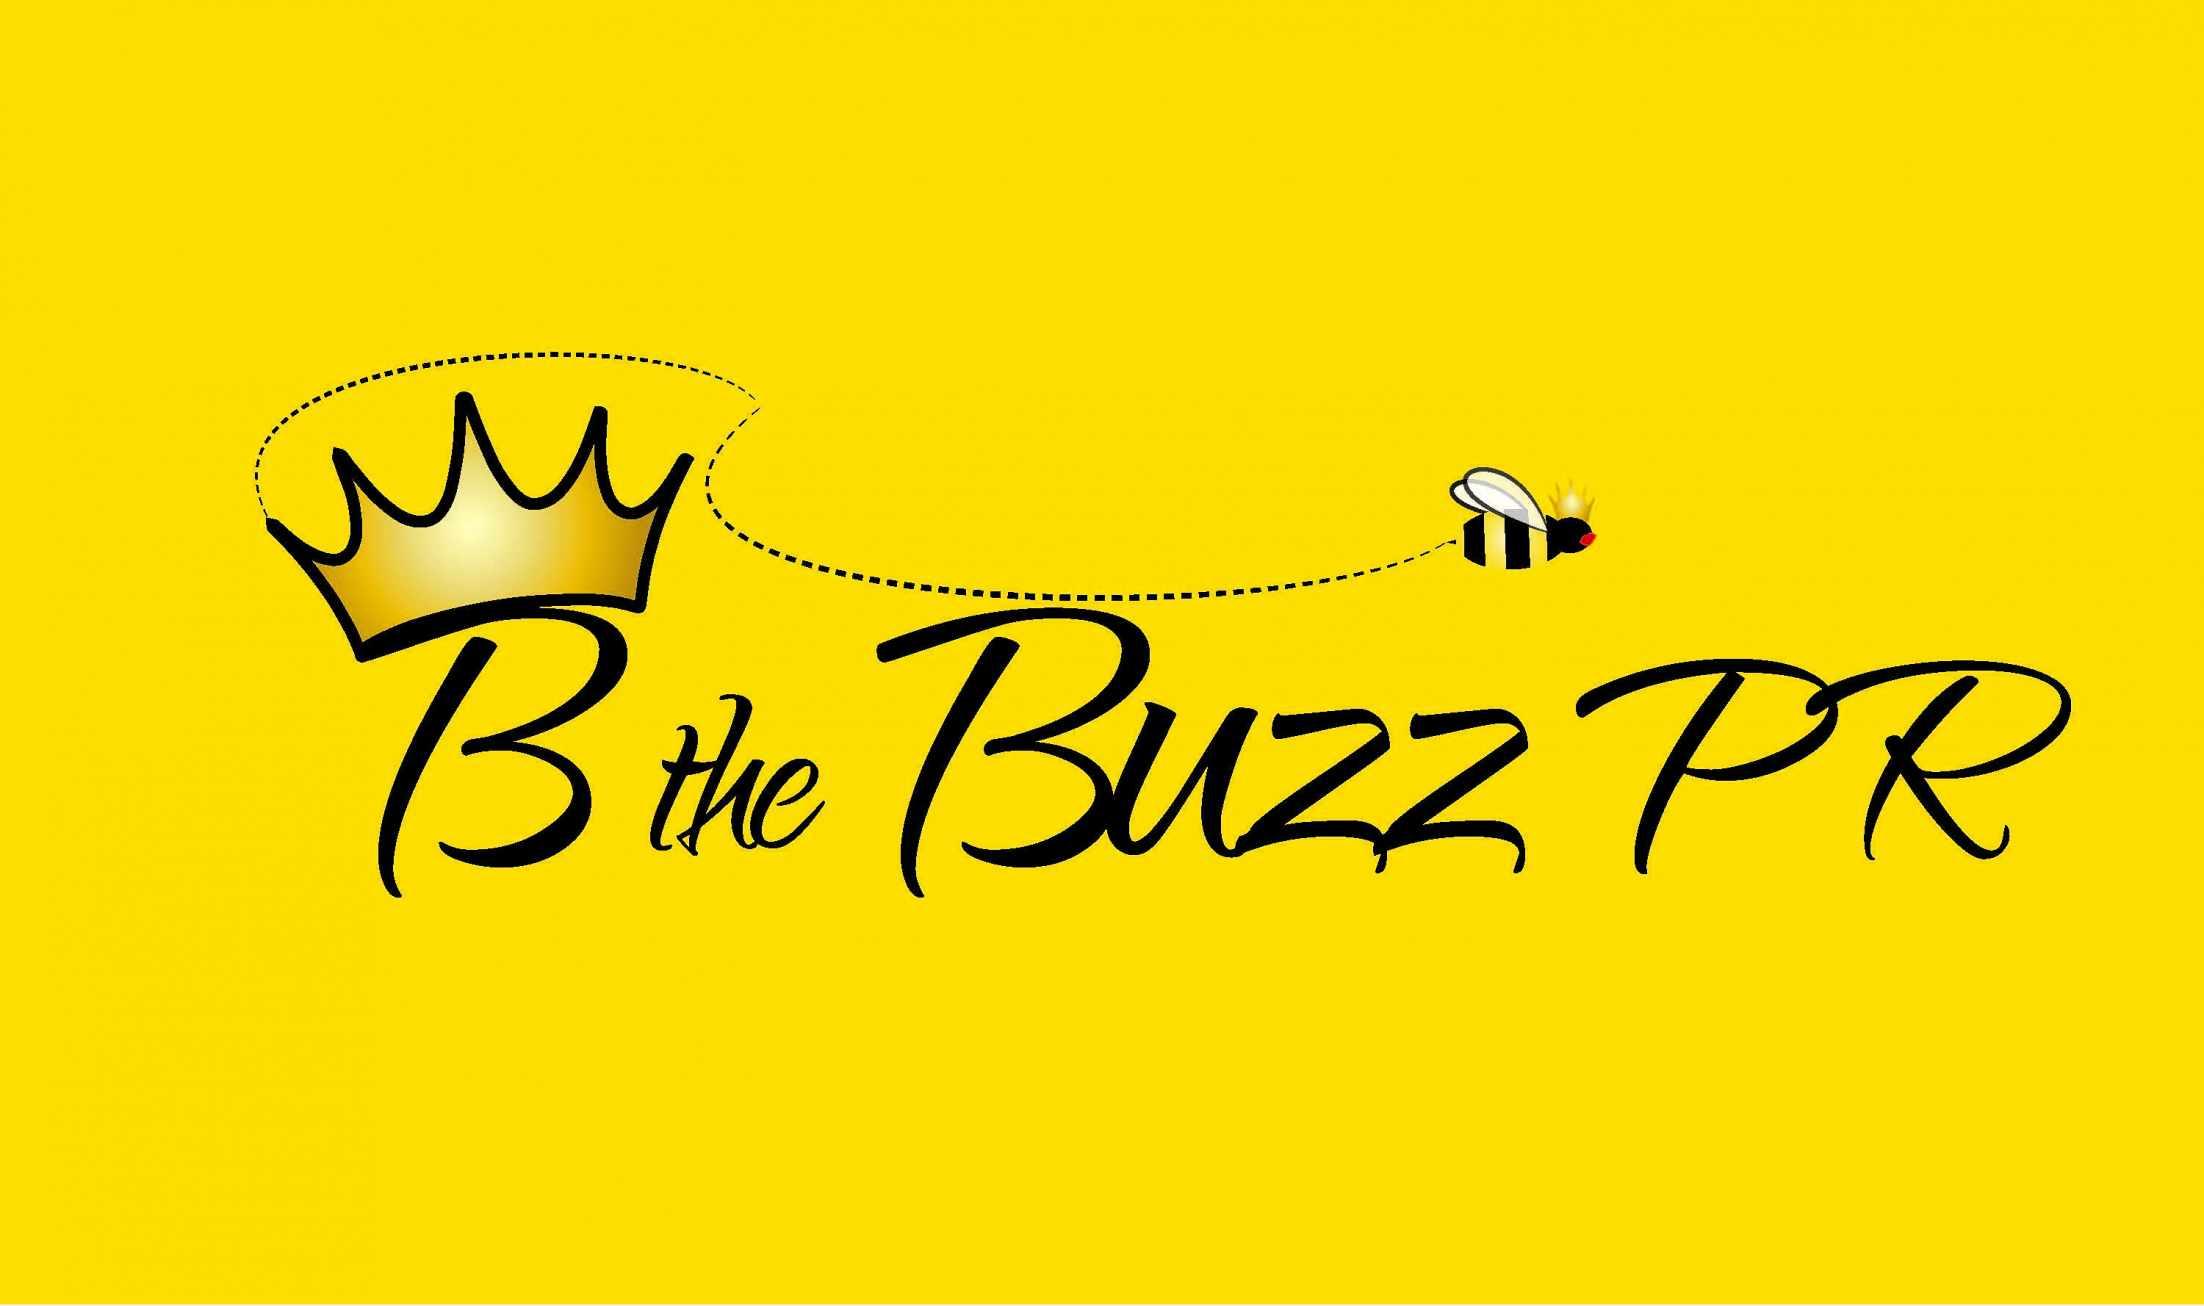 B the Buzz PR Logo